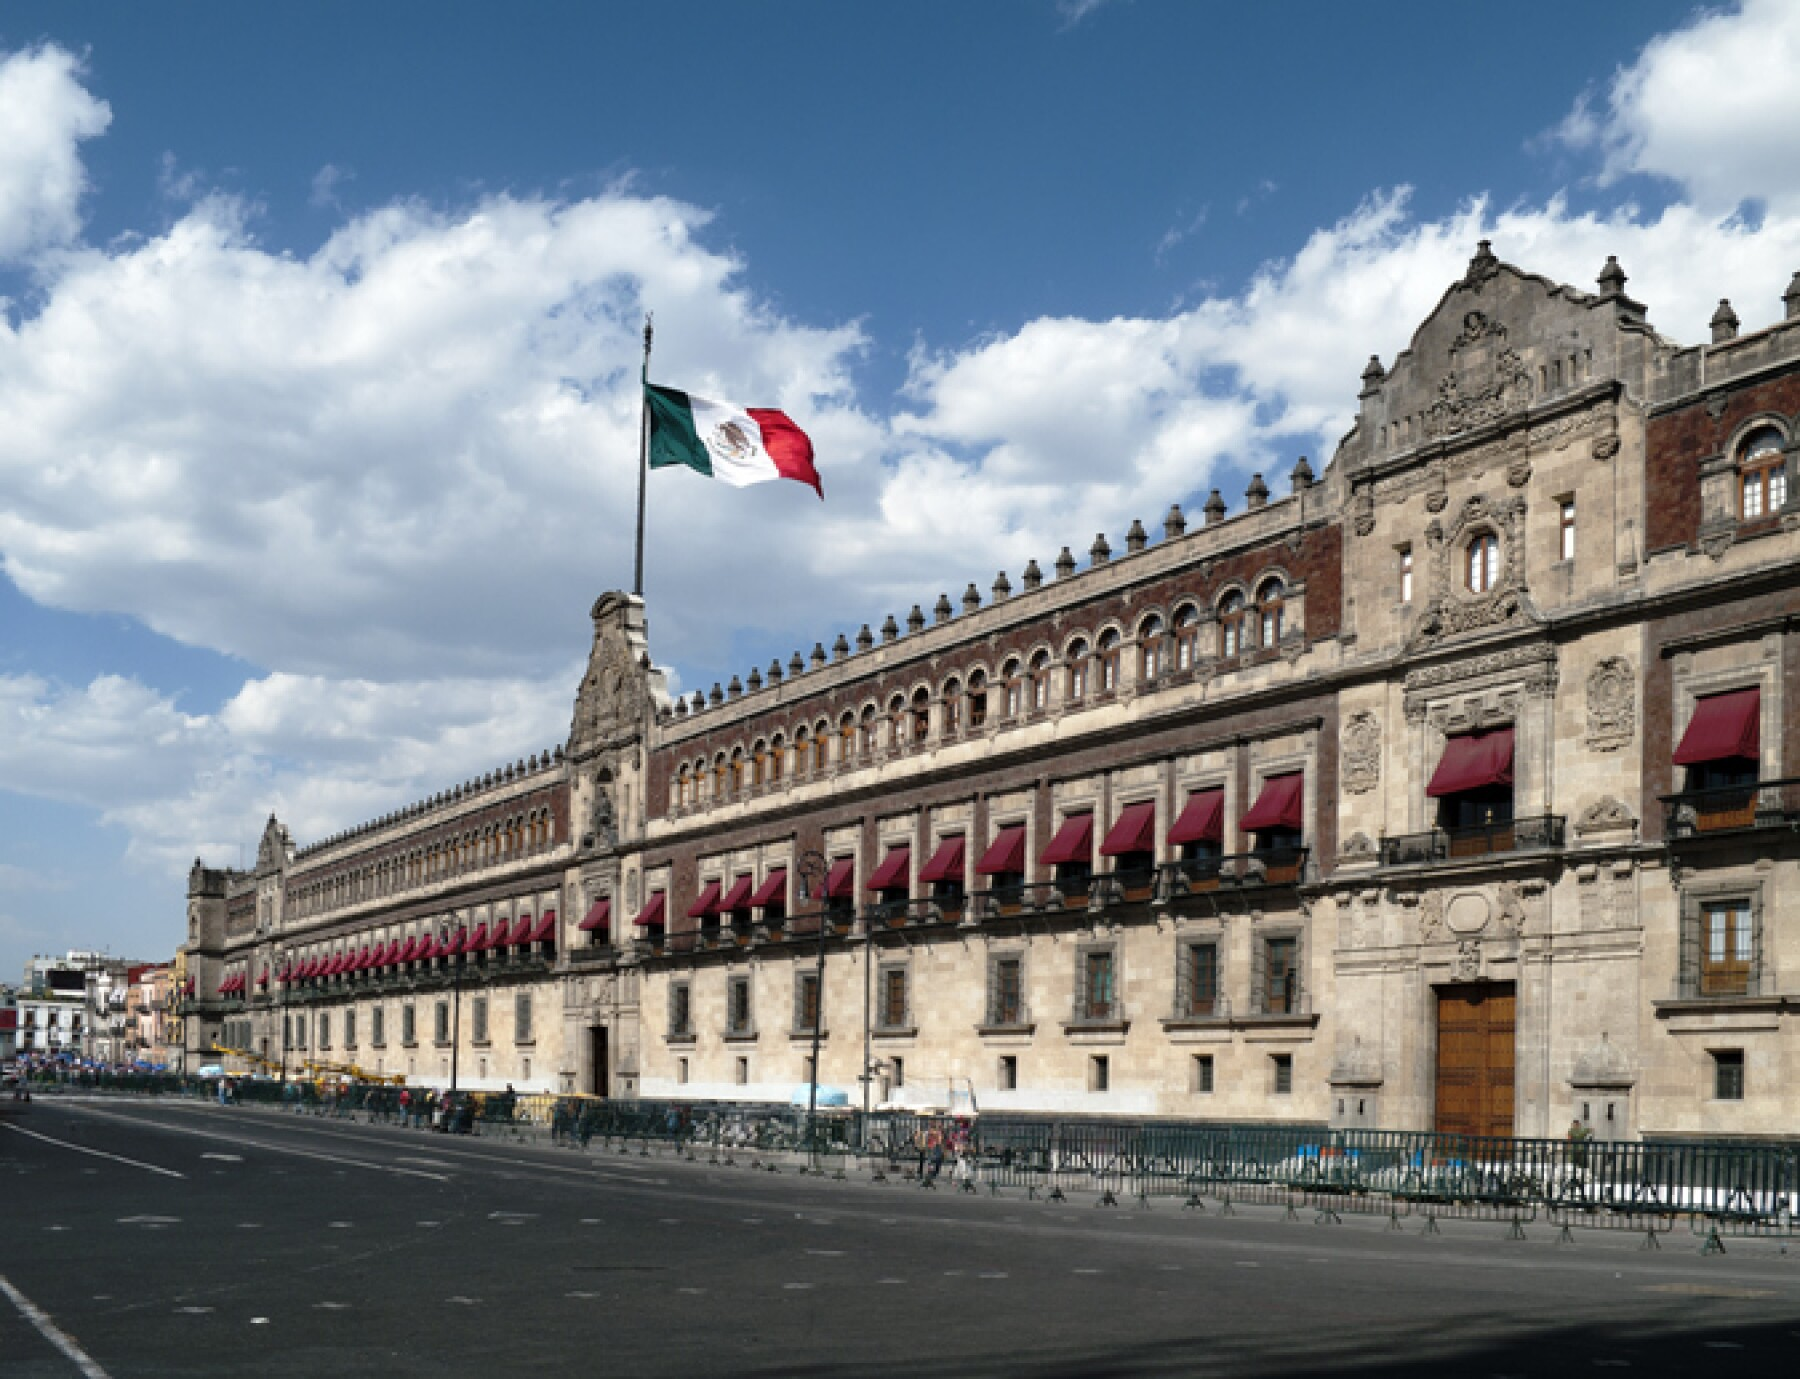 Palacio Nacional (National Palace), Mexico City